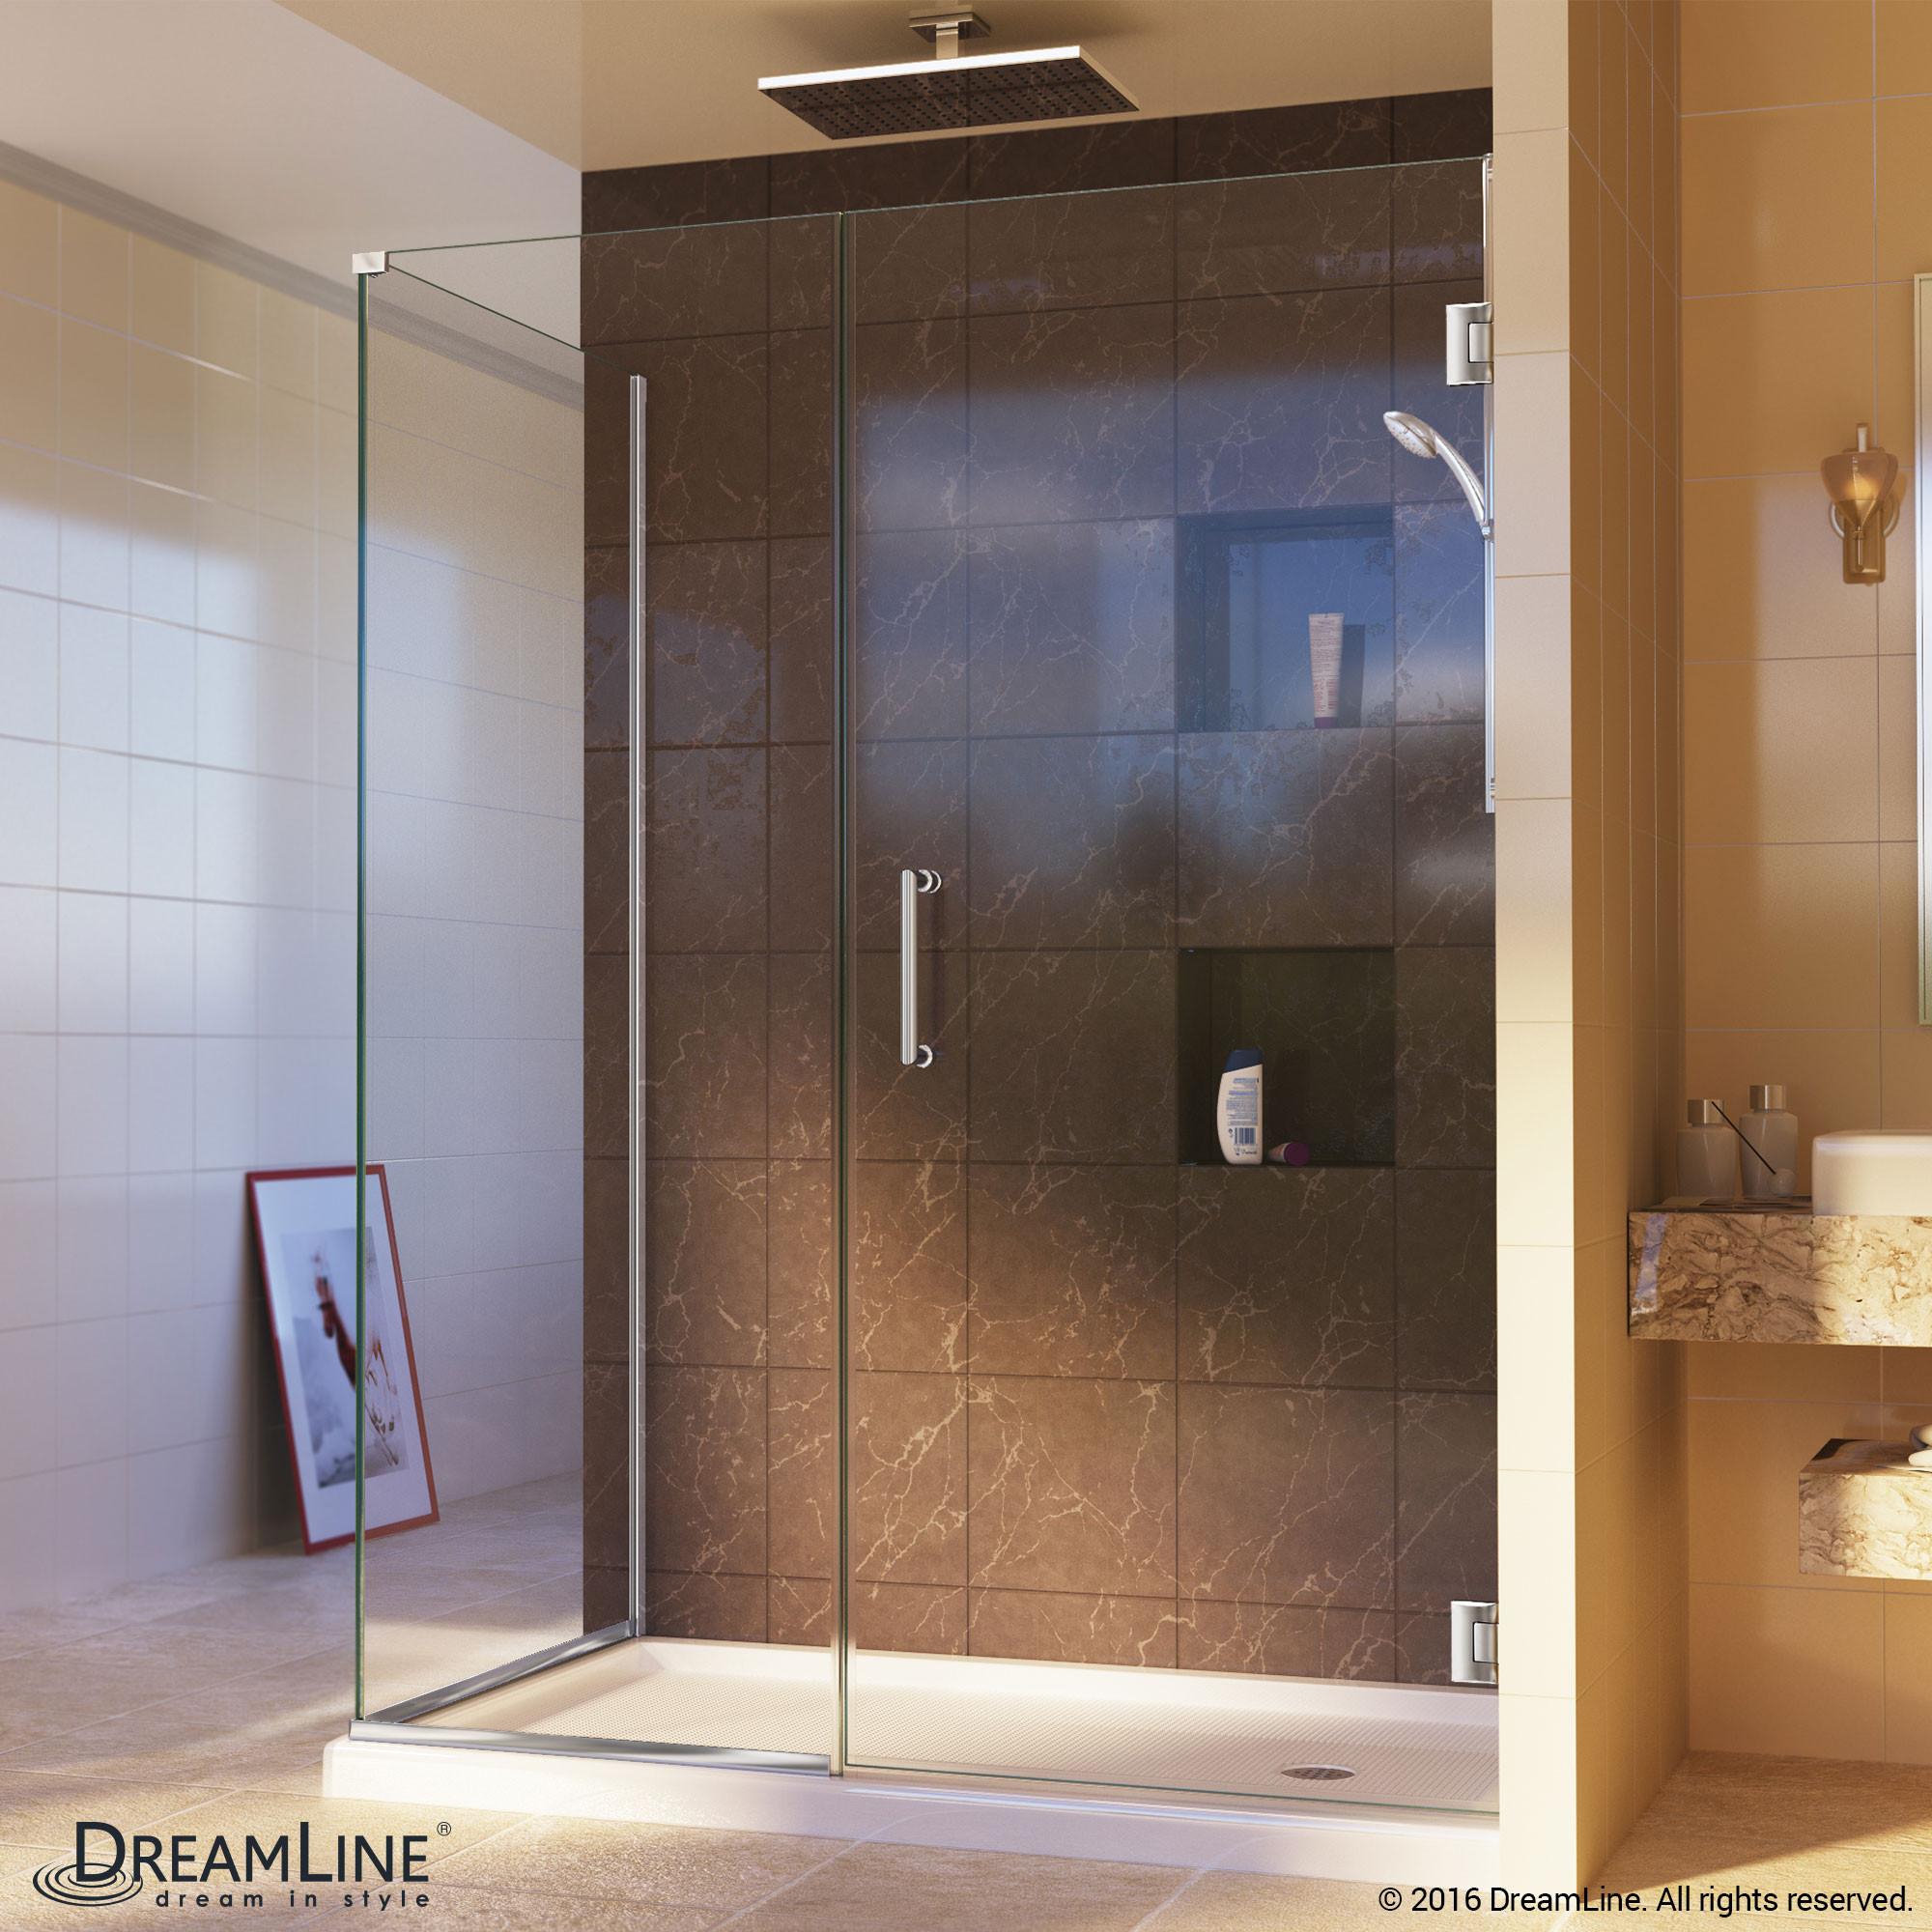 DreamLine SHEN-24290340-01 Unidoor Plus Hinged Shower Enclosure, Chrome Finish Hardware